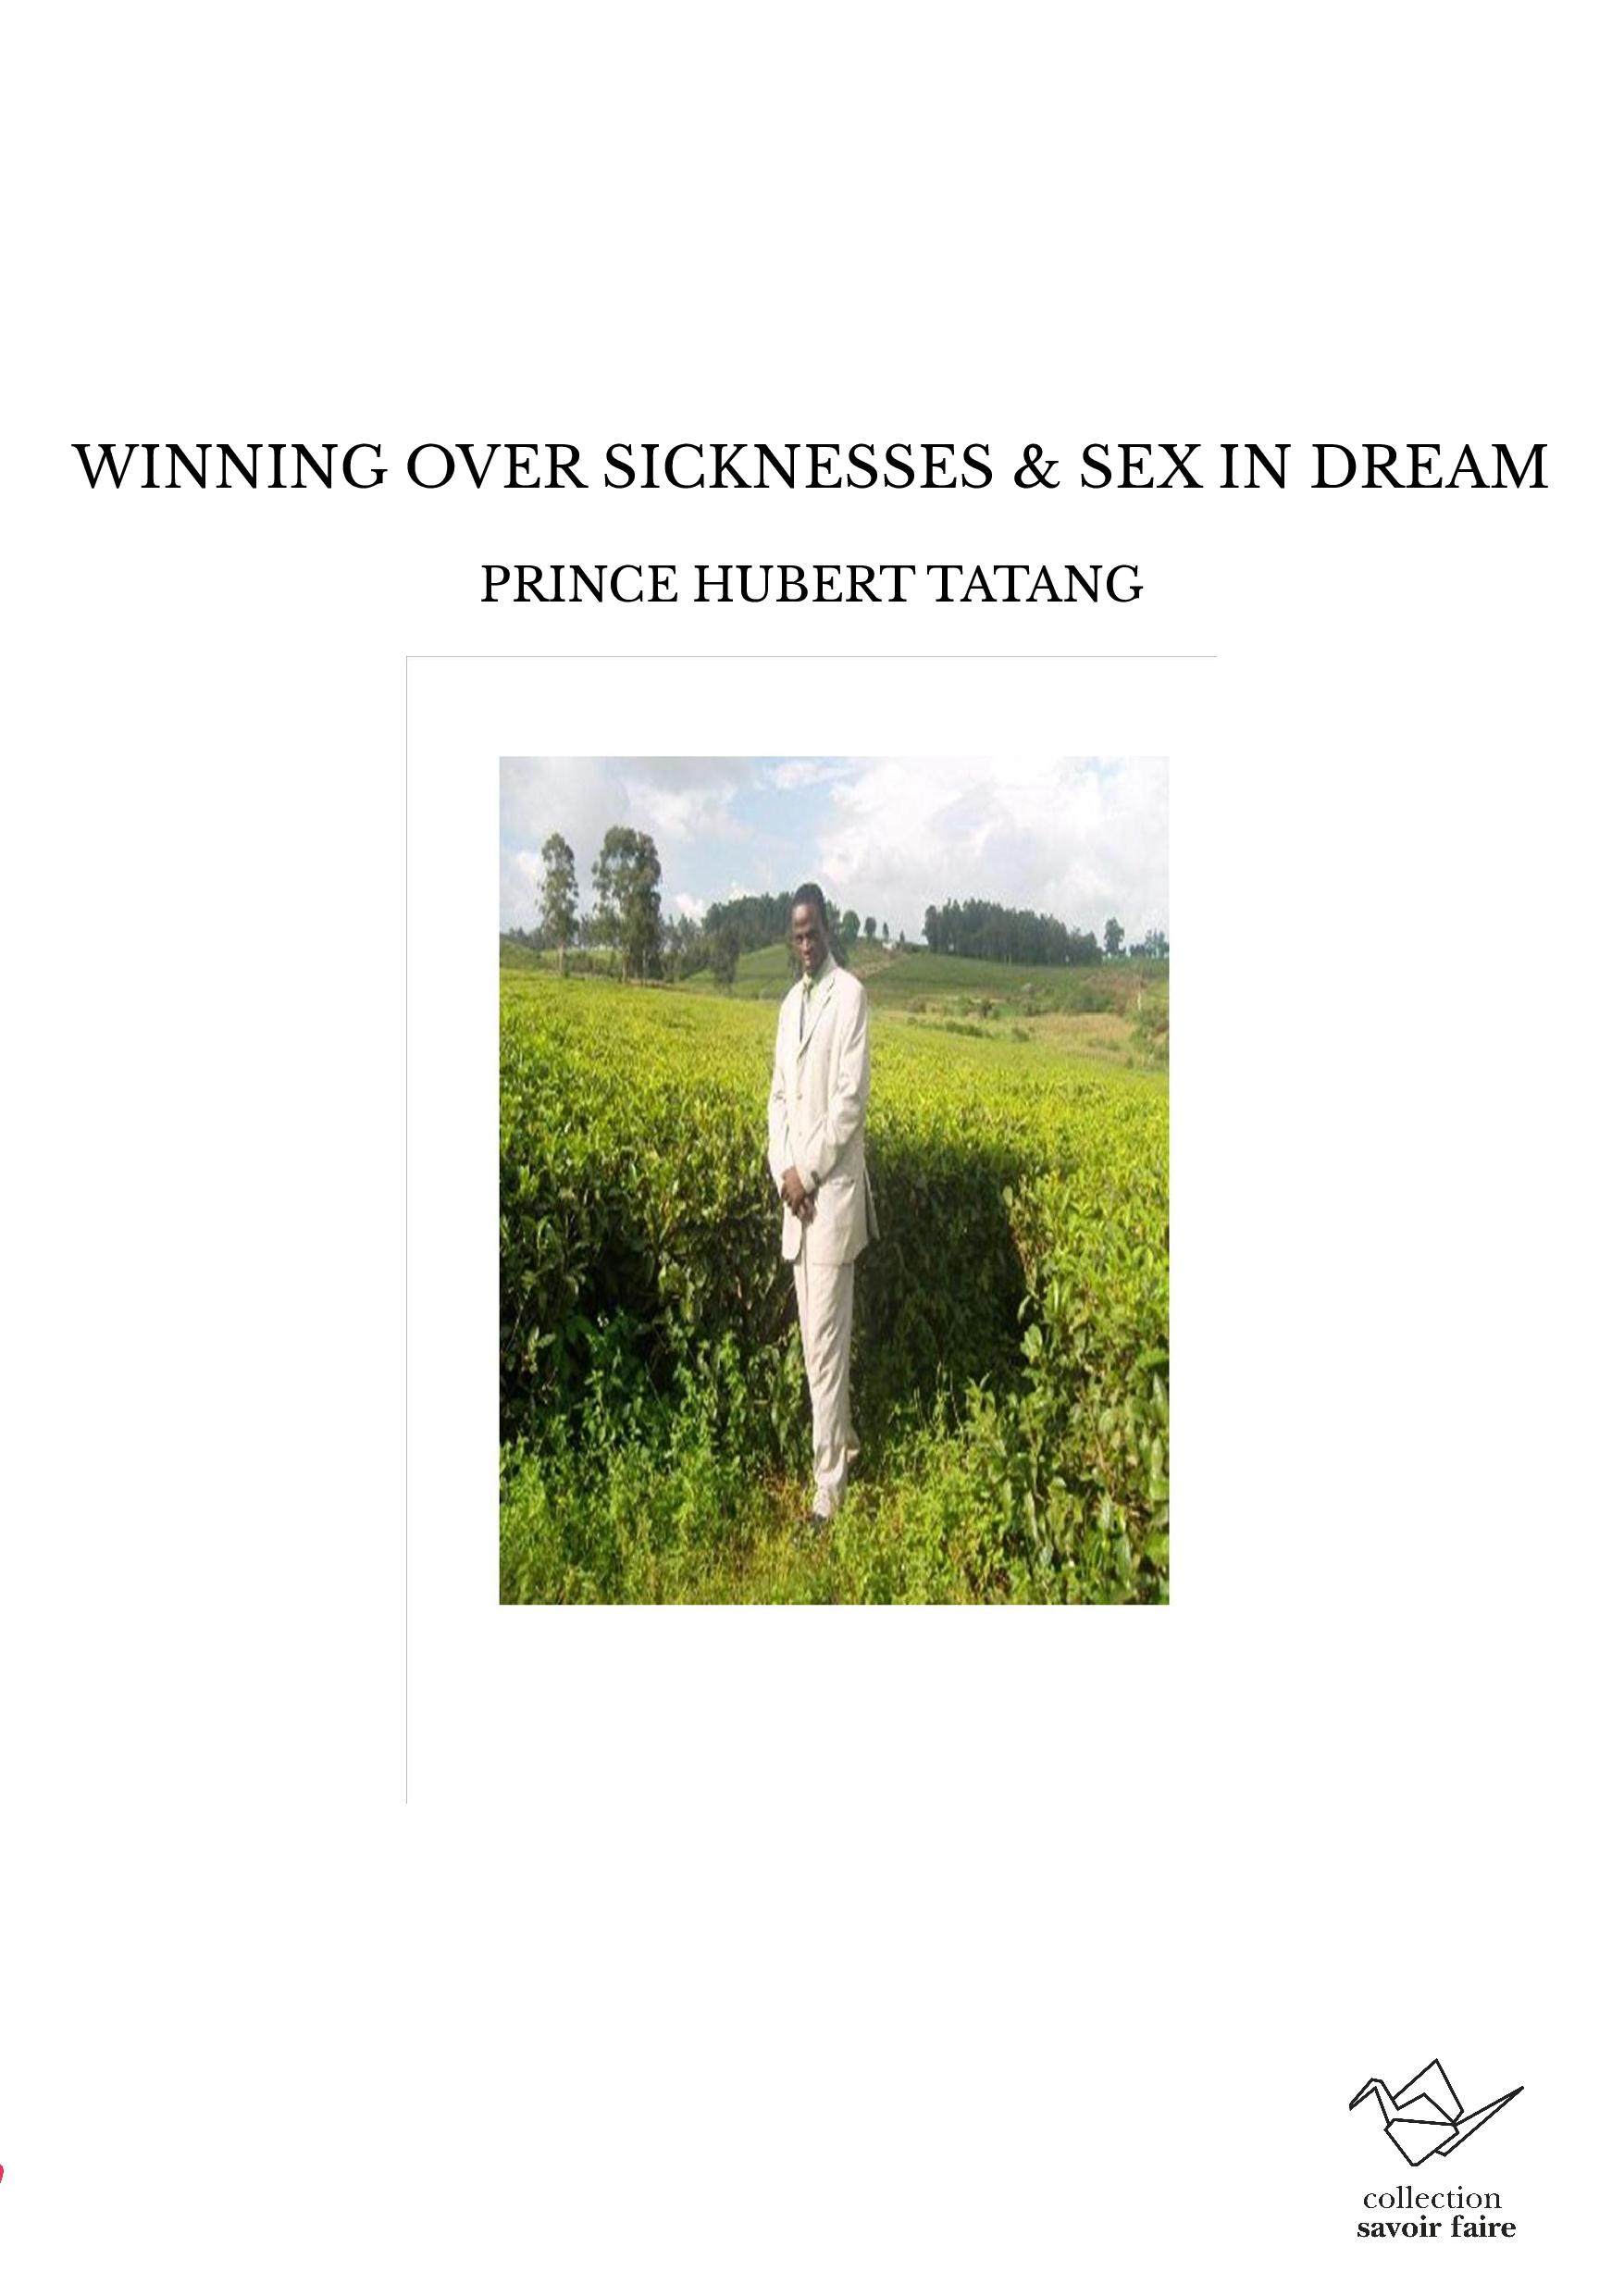 WINNING OVER SICKNESSES & SEX IN DREAM